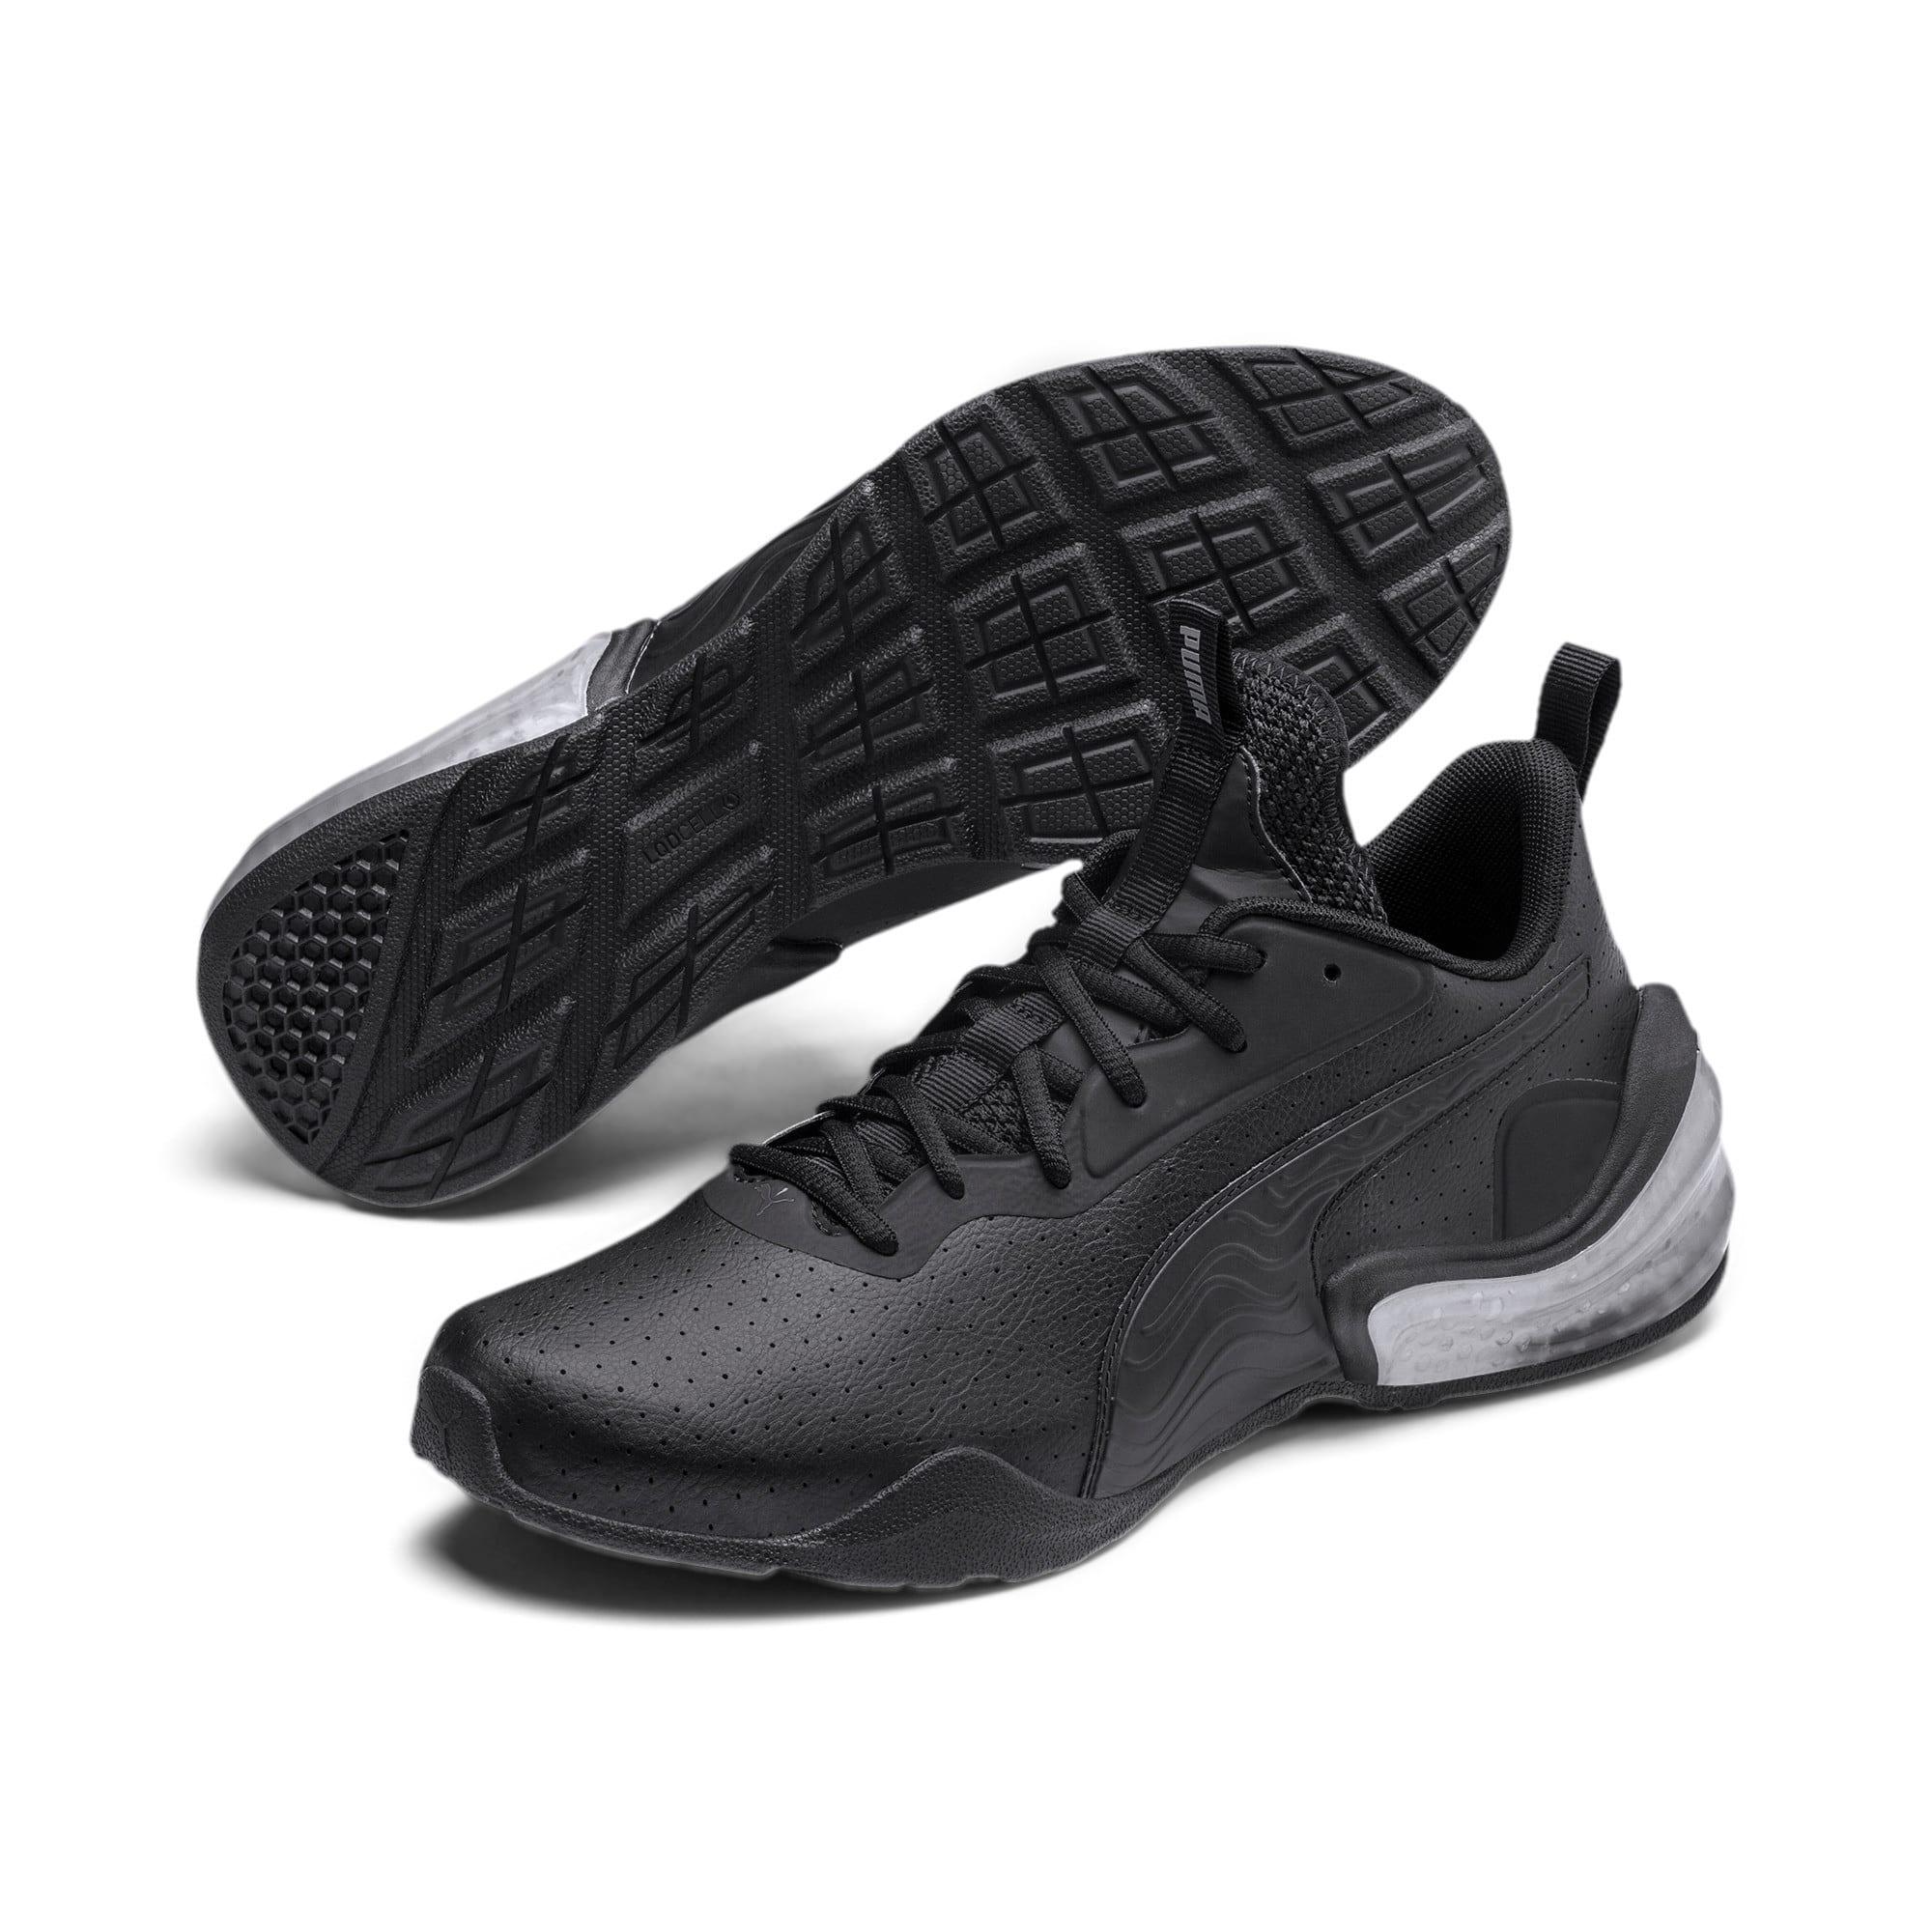 Thumbnail 2 of LQDCELL Challenge Perf Men's Training Shoes, Puma Black-CASTLEROCK, medium